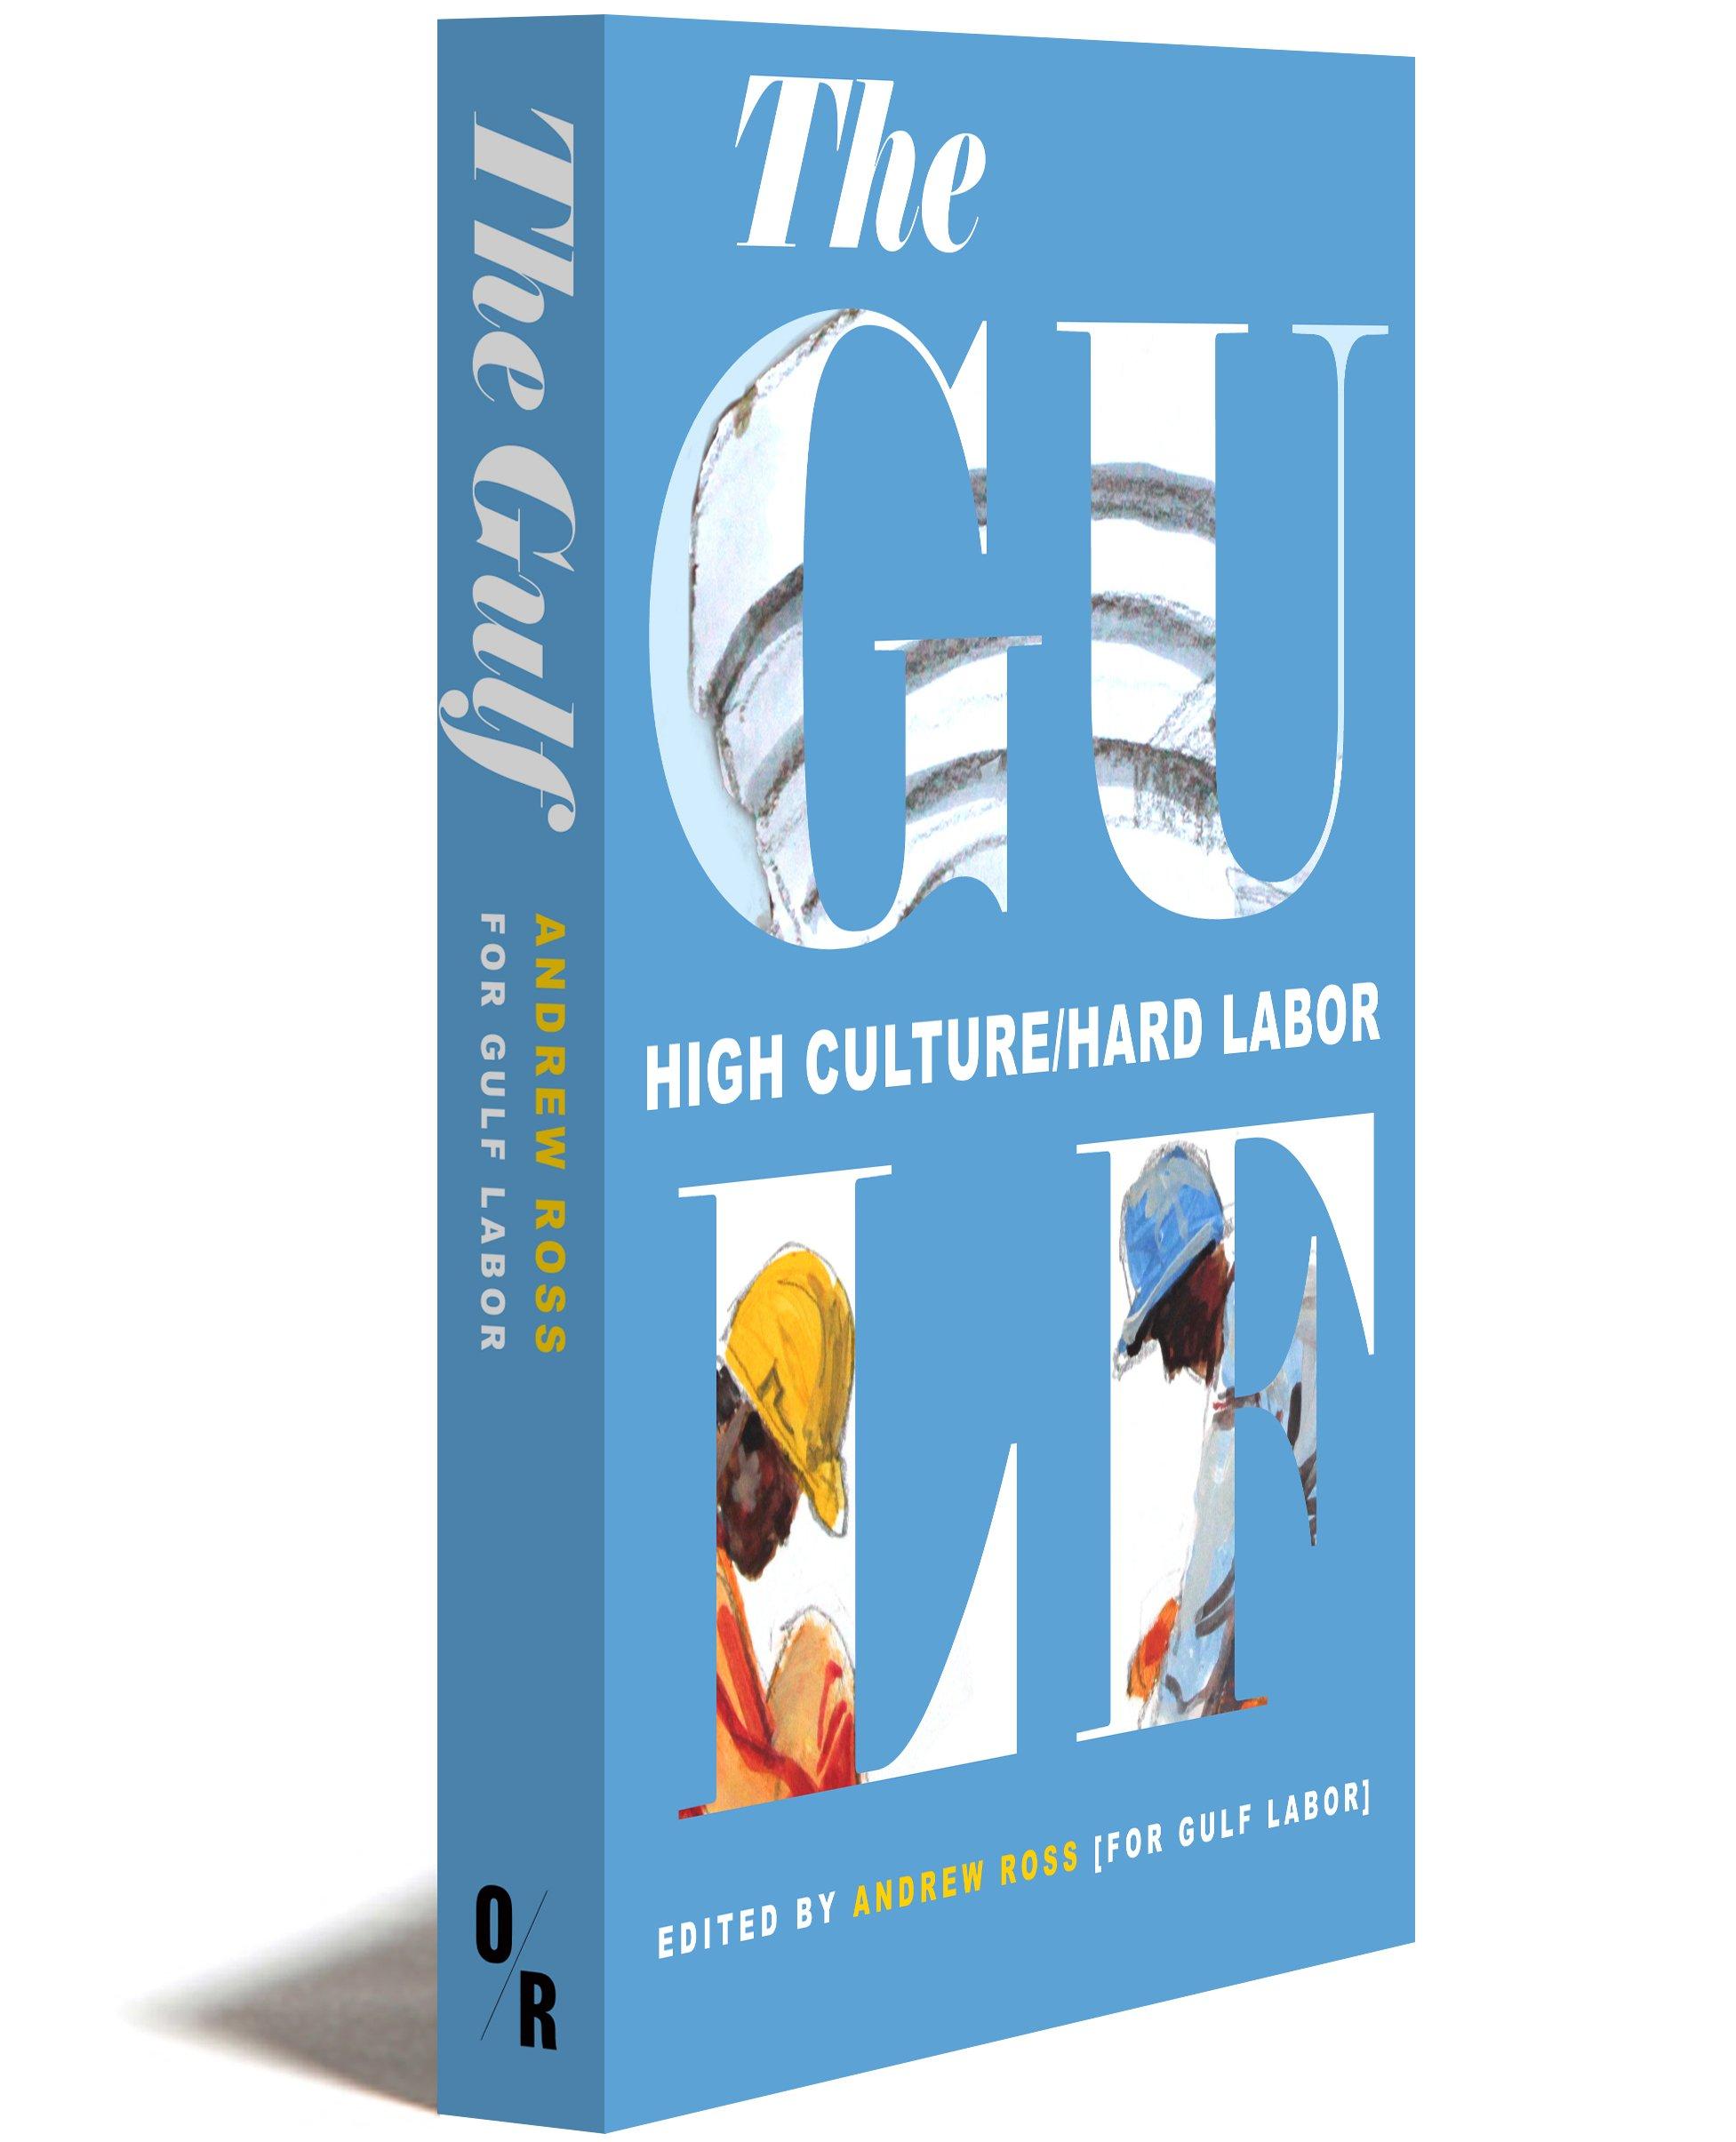 The Gulf High Culture Hard Labor Andrew Ross 9781682190043 Amazon Com Books